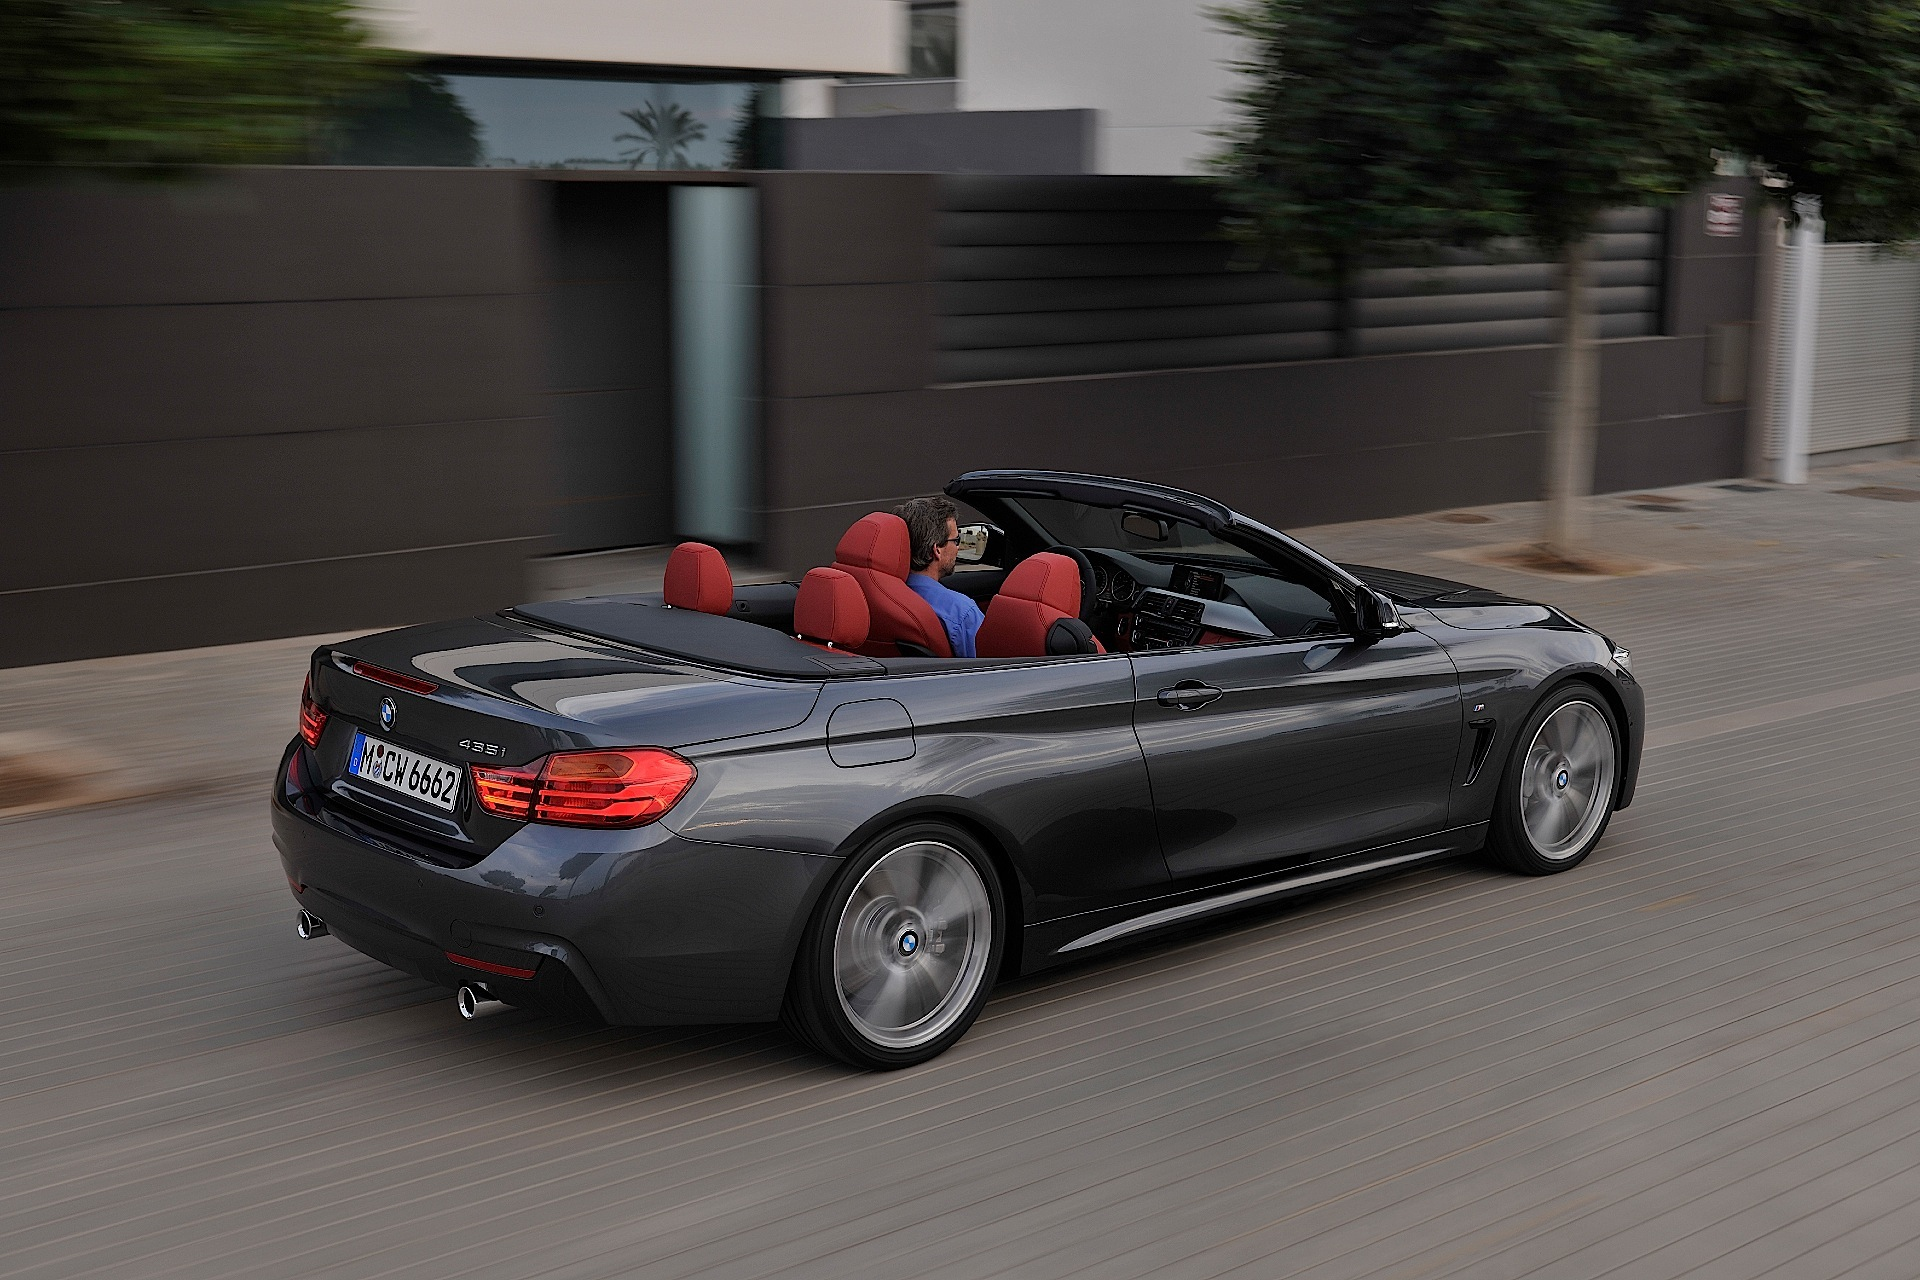 Bmw 428i Convertible 2017 >> BMW 4 Series Cabrio specs - 2014, 2015, 2016, 2017, 2018 - autoevolution